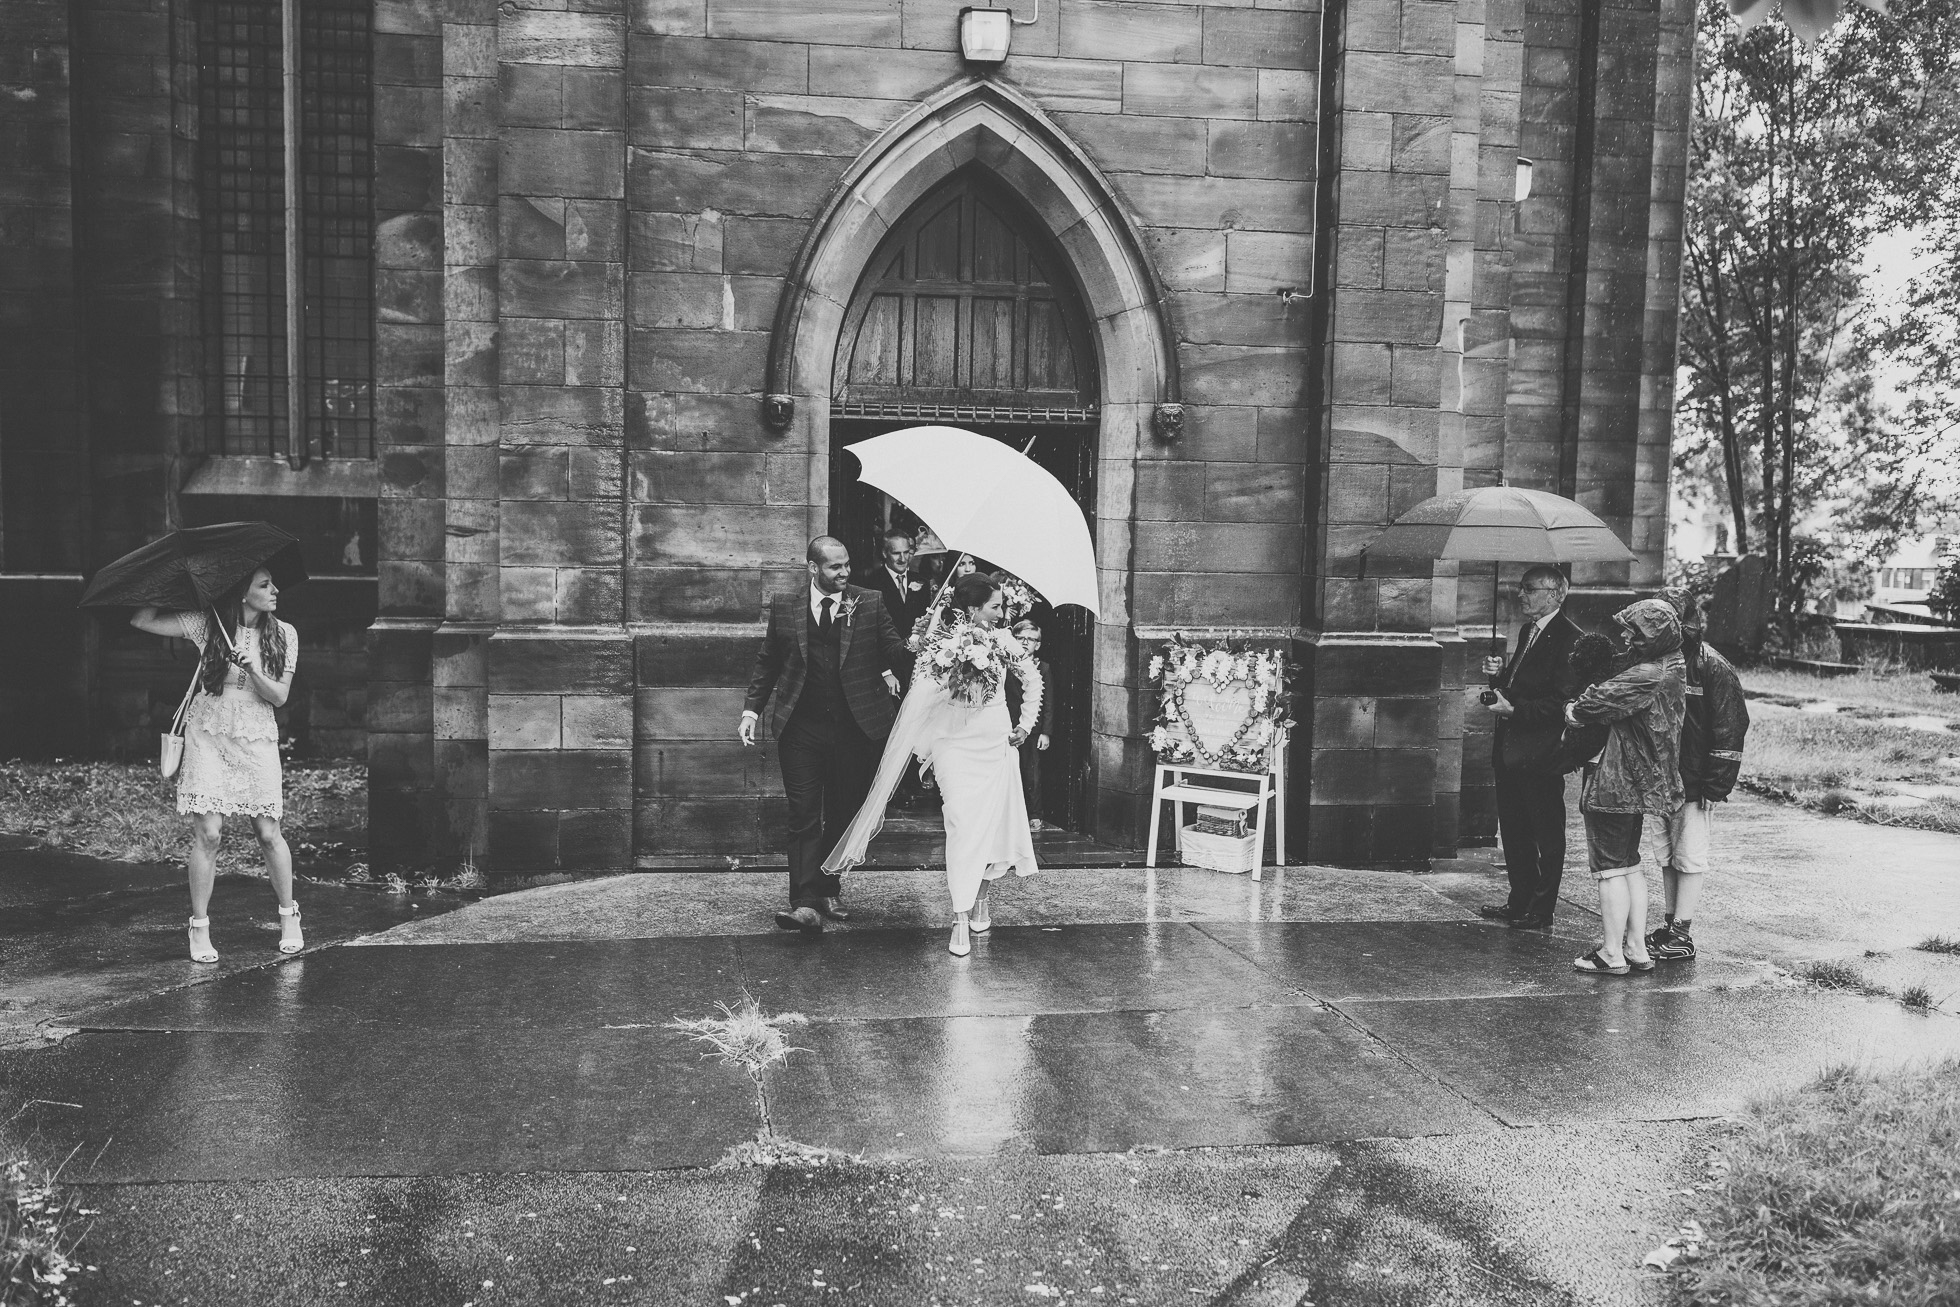 woodman_inn_thunderbridge_wedding_photographer-65.jpg